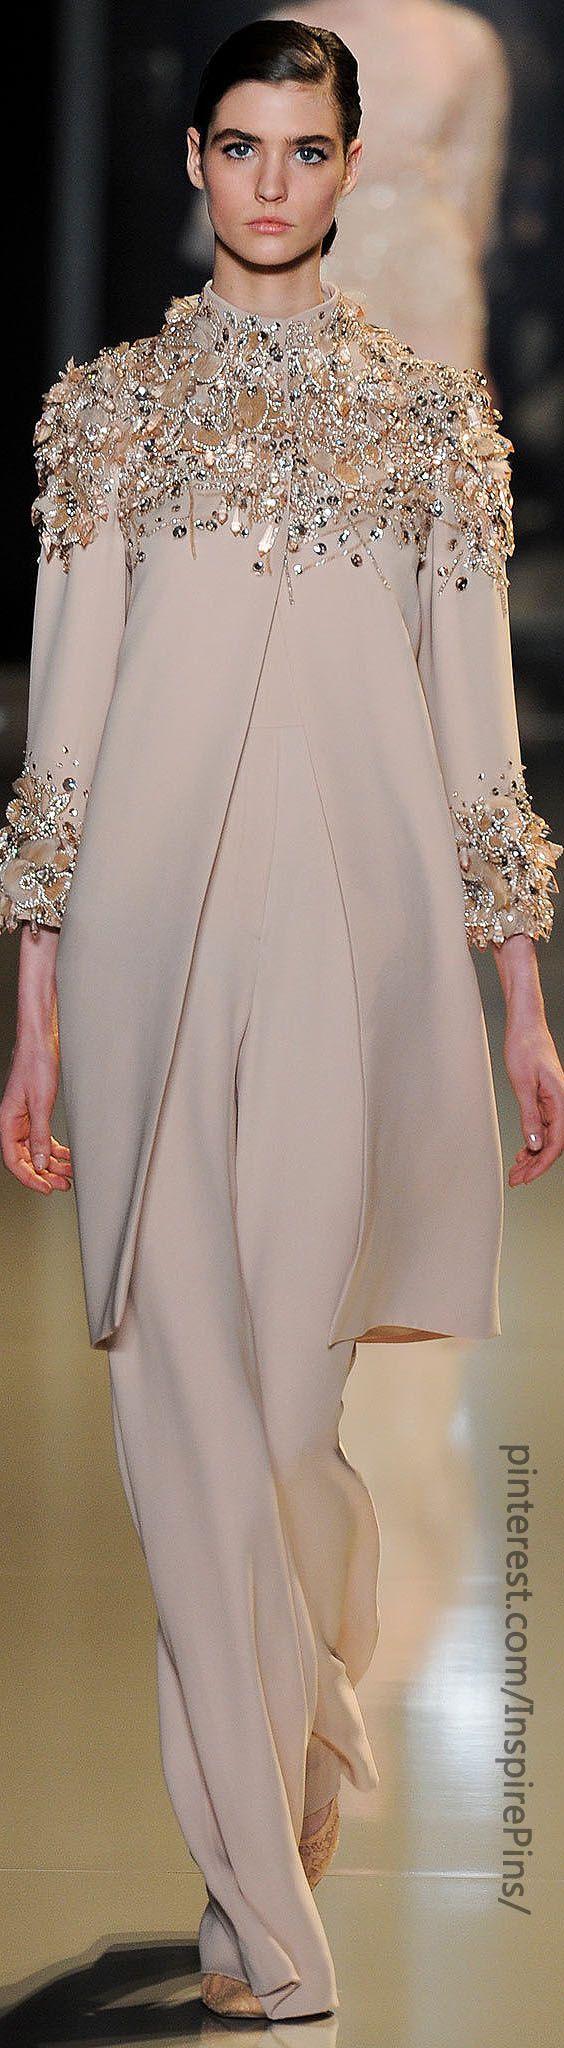 #jadealyciainc Spring Couture Elie Saab